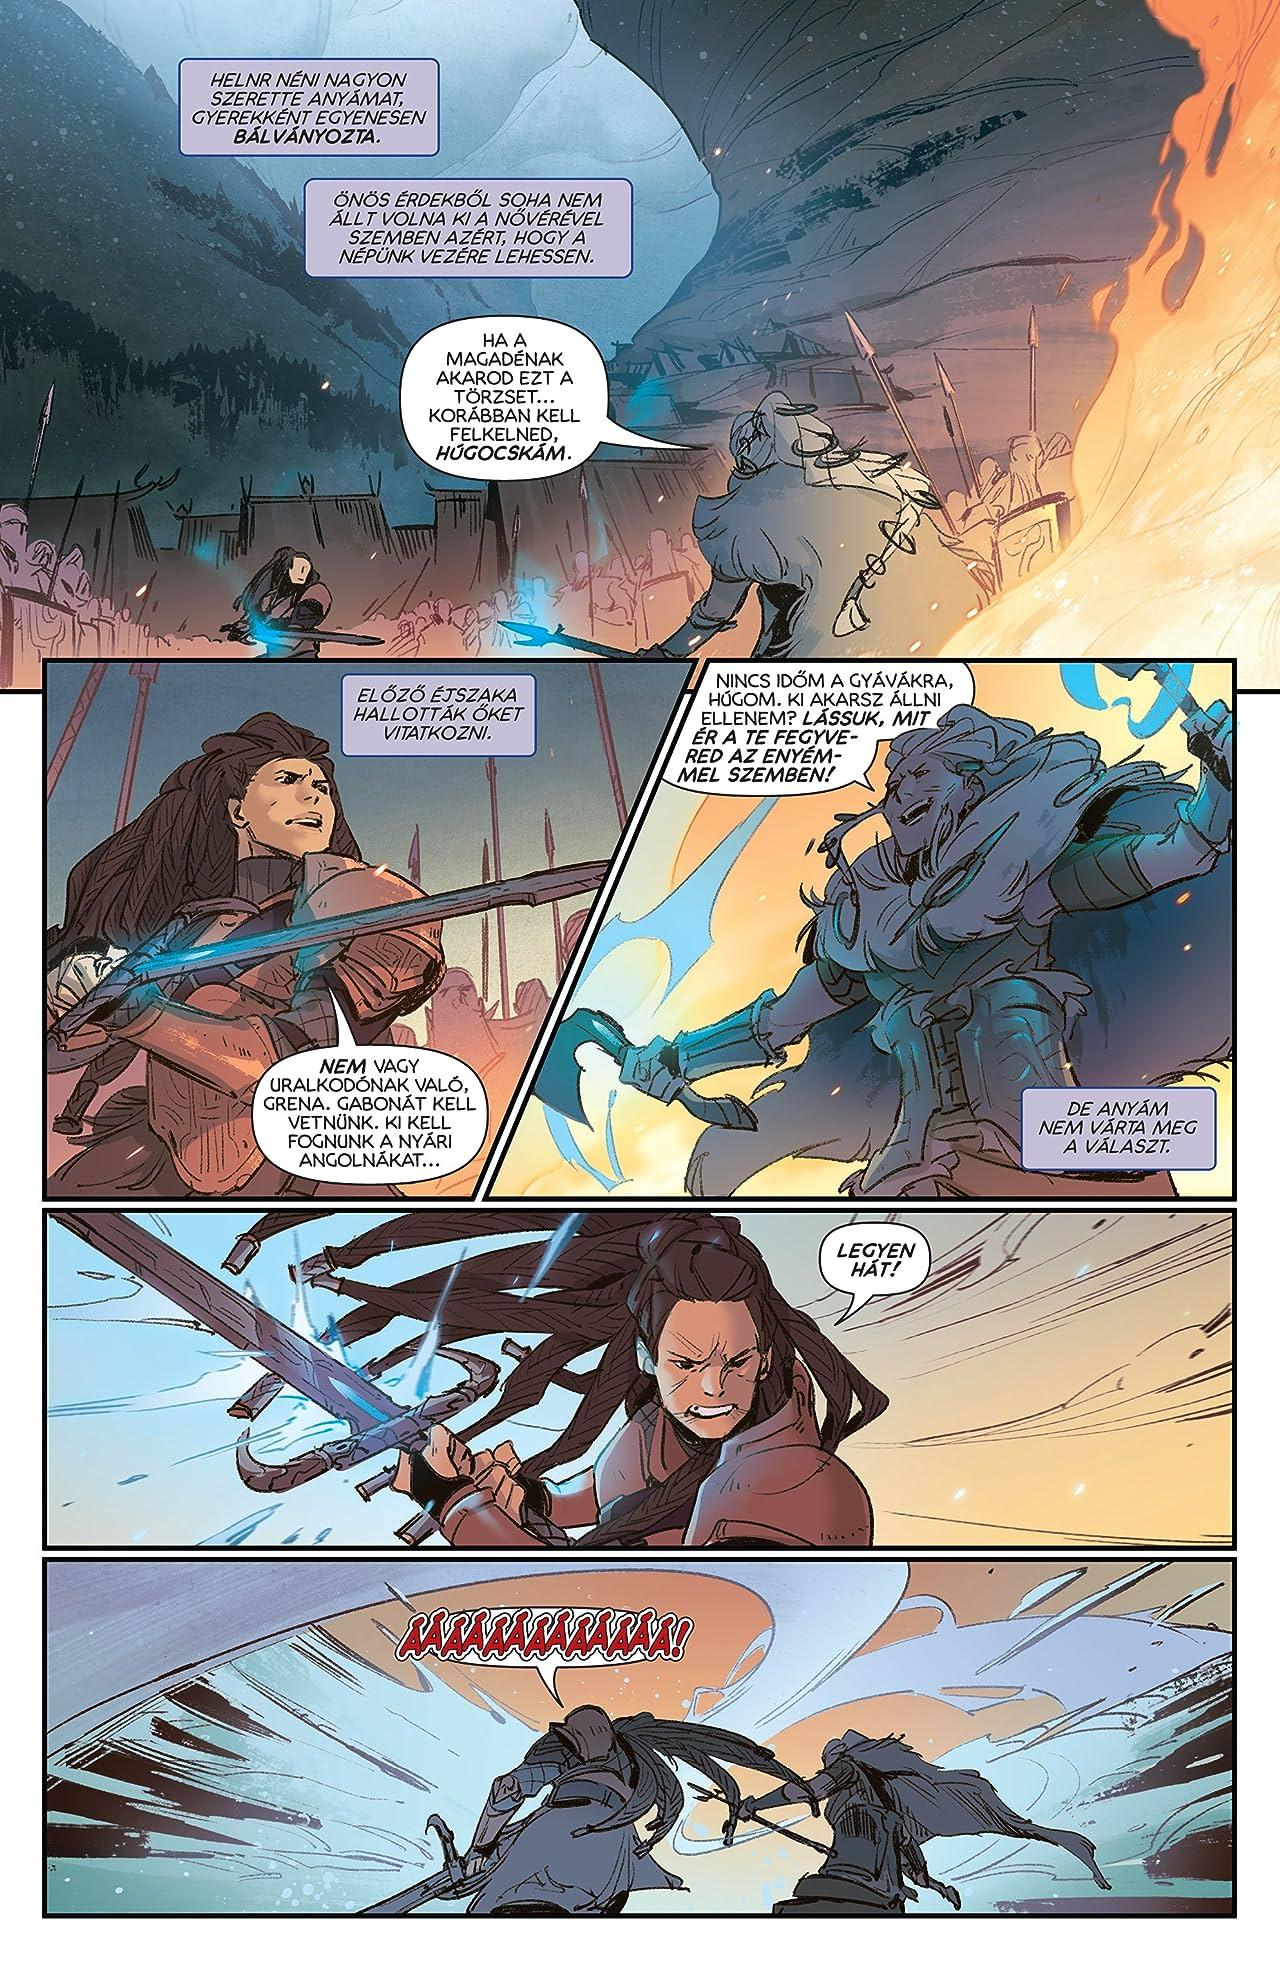 League of Legends: Ashe: A Hadfőnök Képregénysorozat Gyűjteménye Special Edition (Hungarian) #1 (of 4)